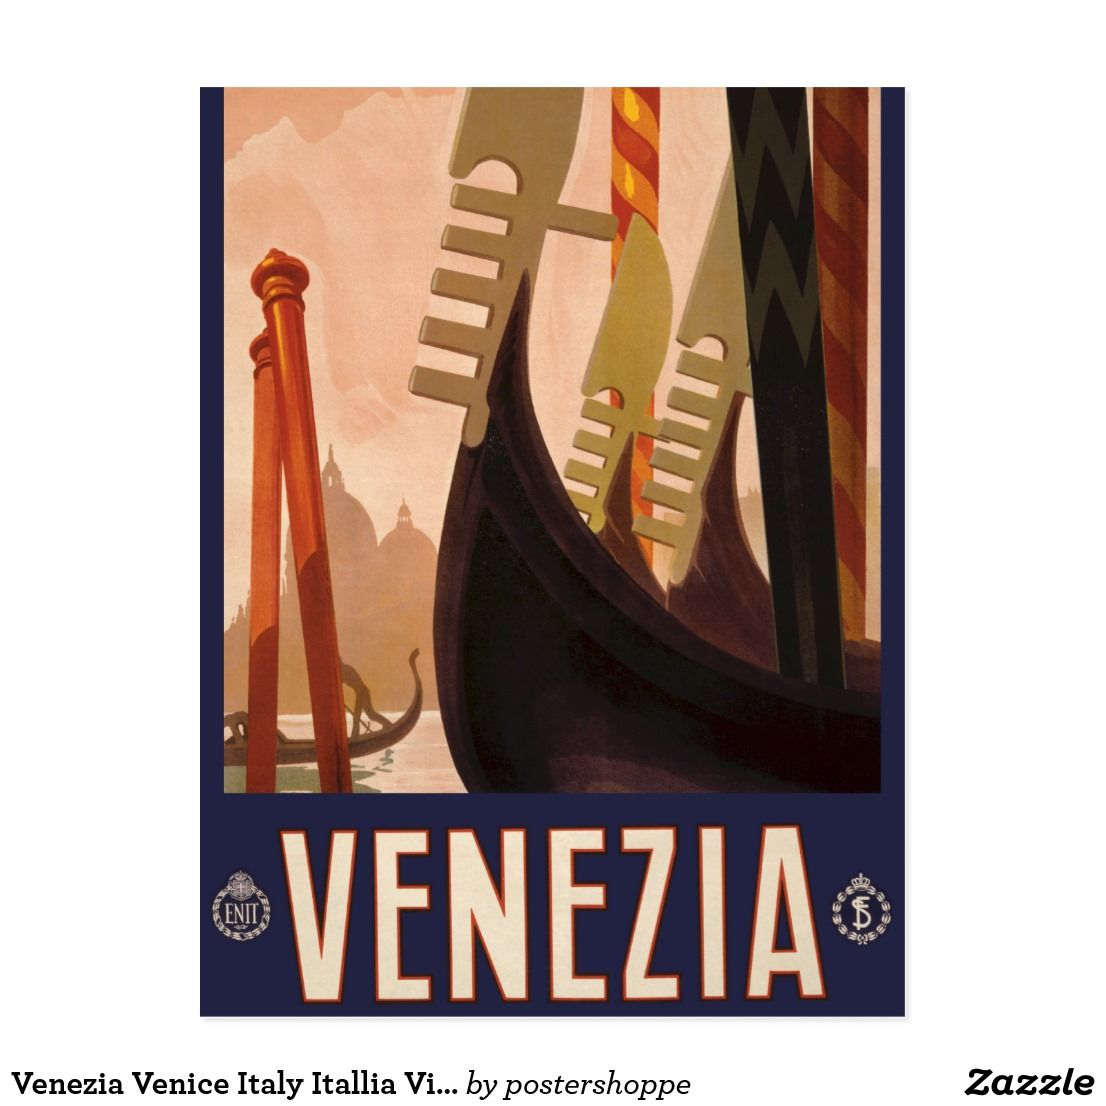 Venice Travel Framed Canvas Art Print Poster A4 A3 Bar Retro Vintage Lido